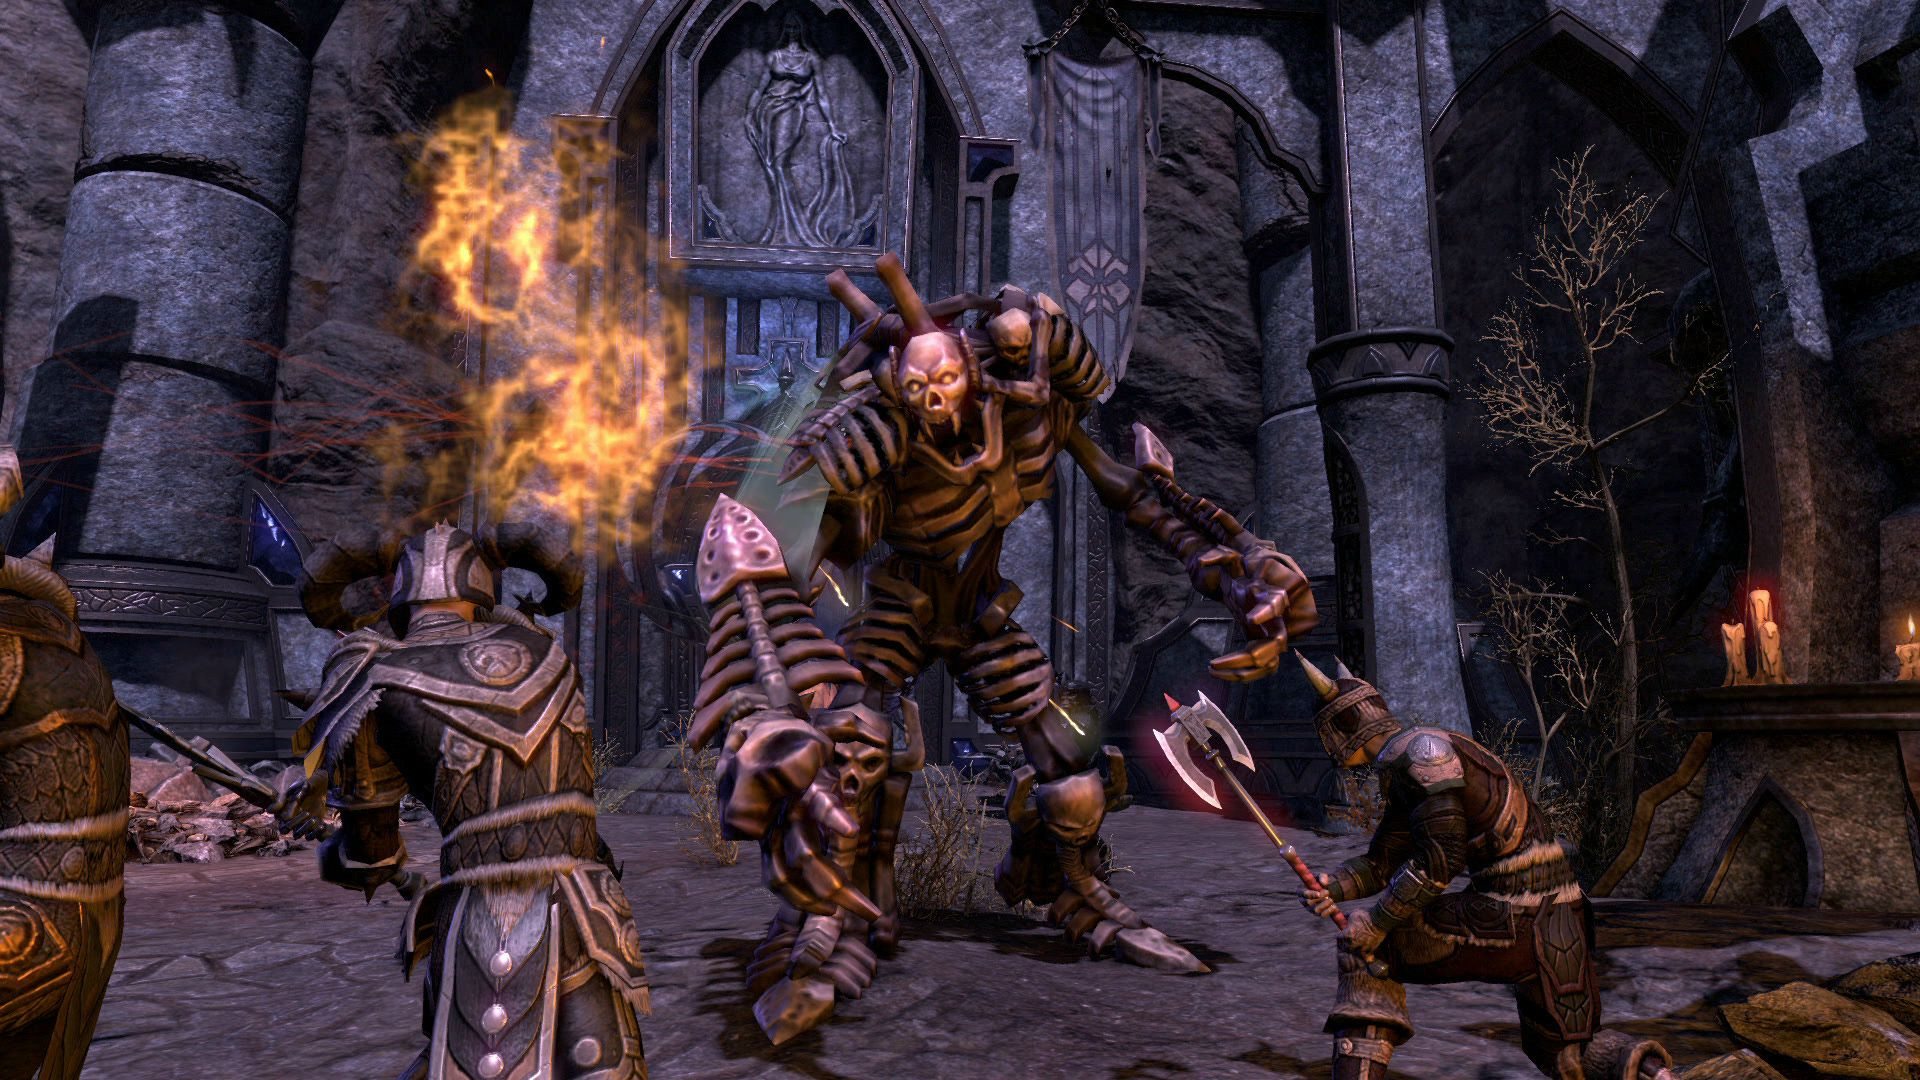 Elder Scrolls Online Screenshots Travel Across Tamriel #24399